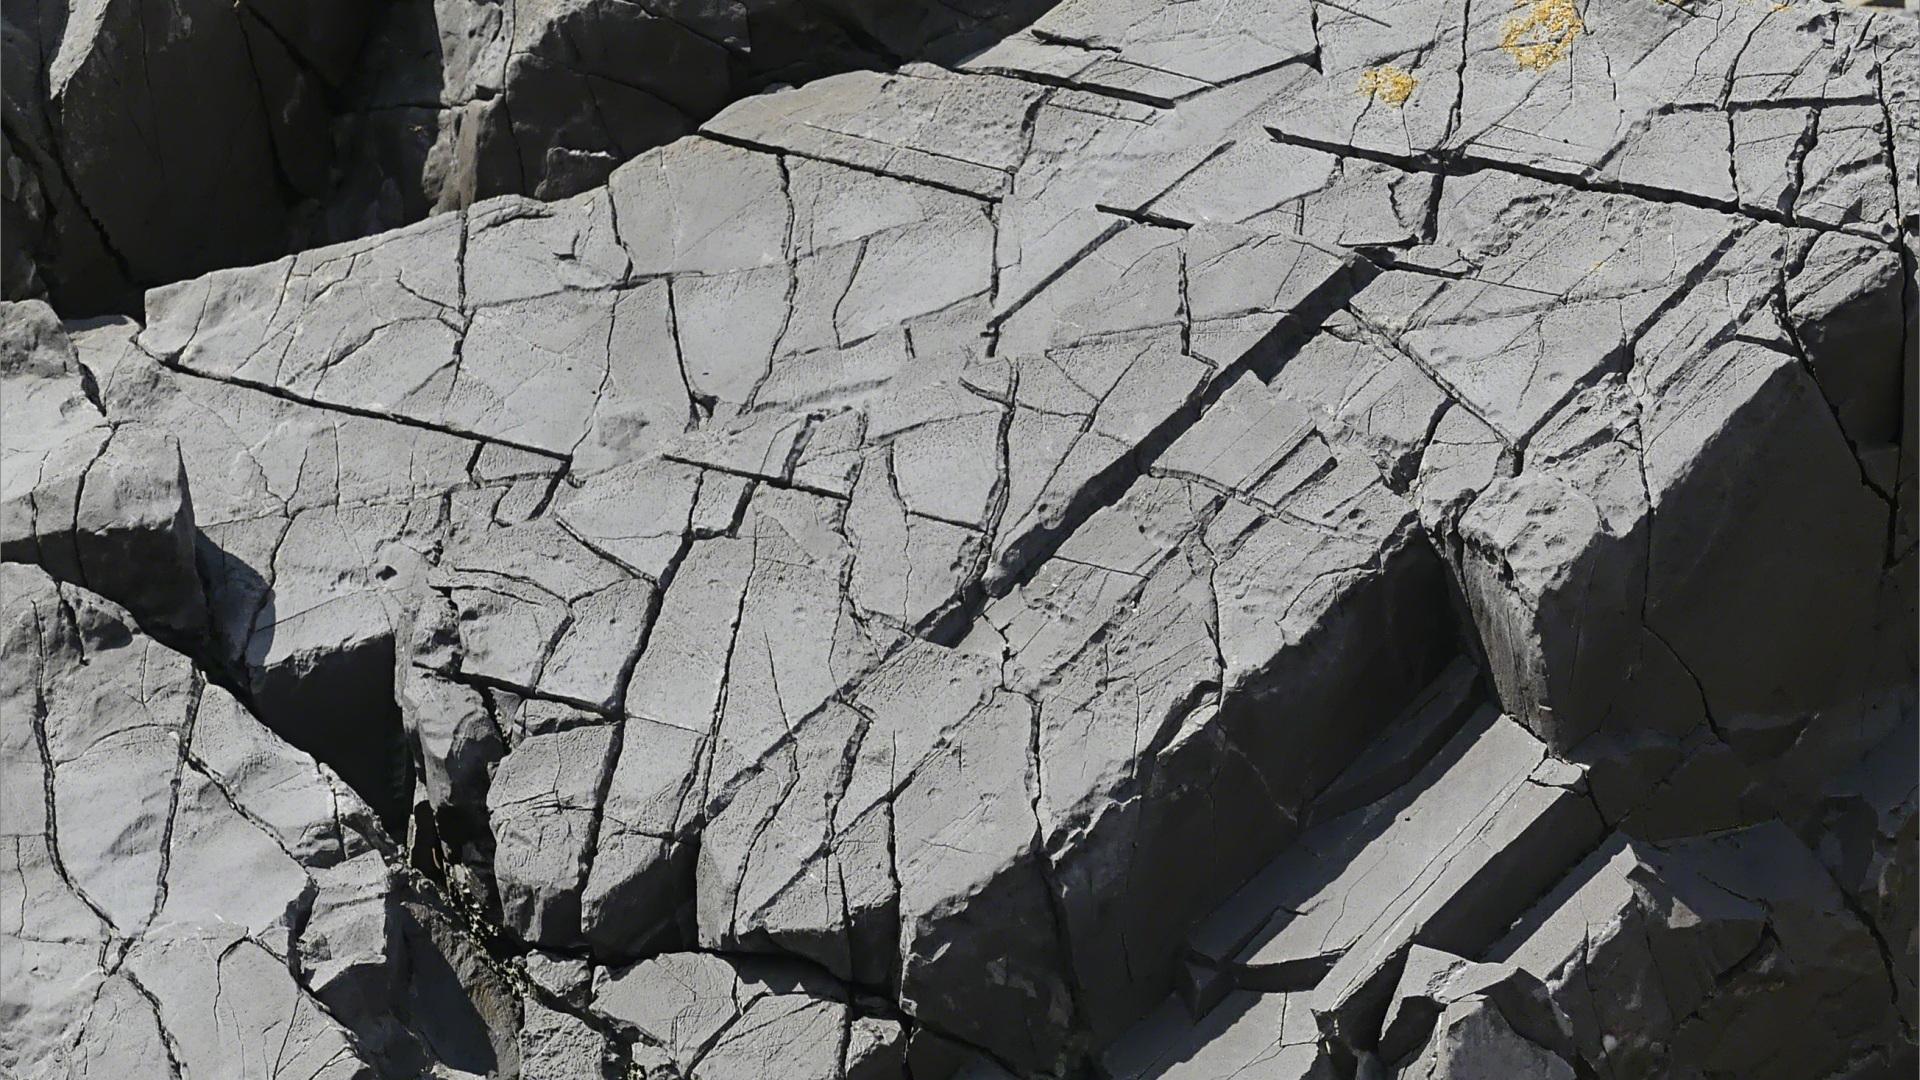 Erosion patterns on sedimentary rocks